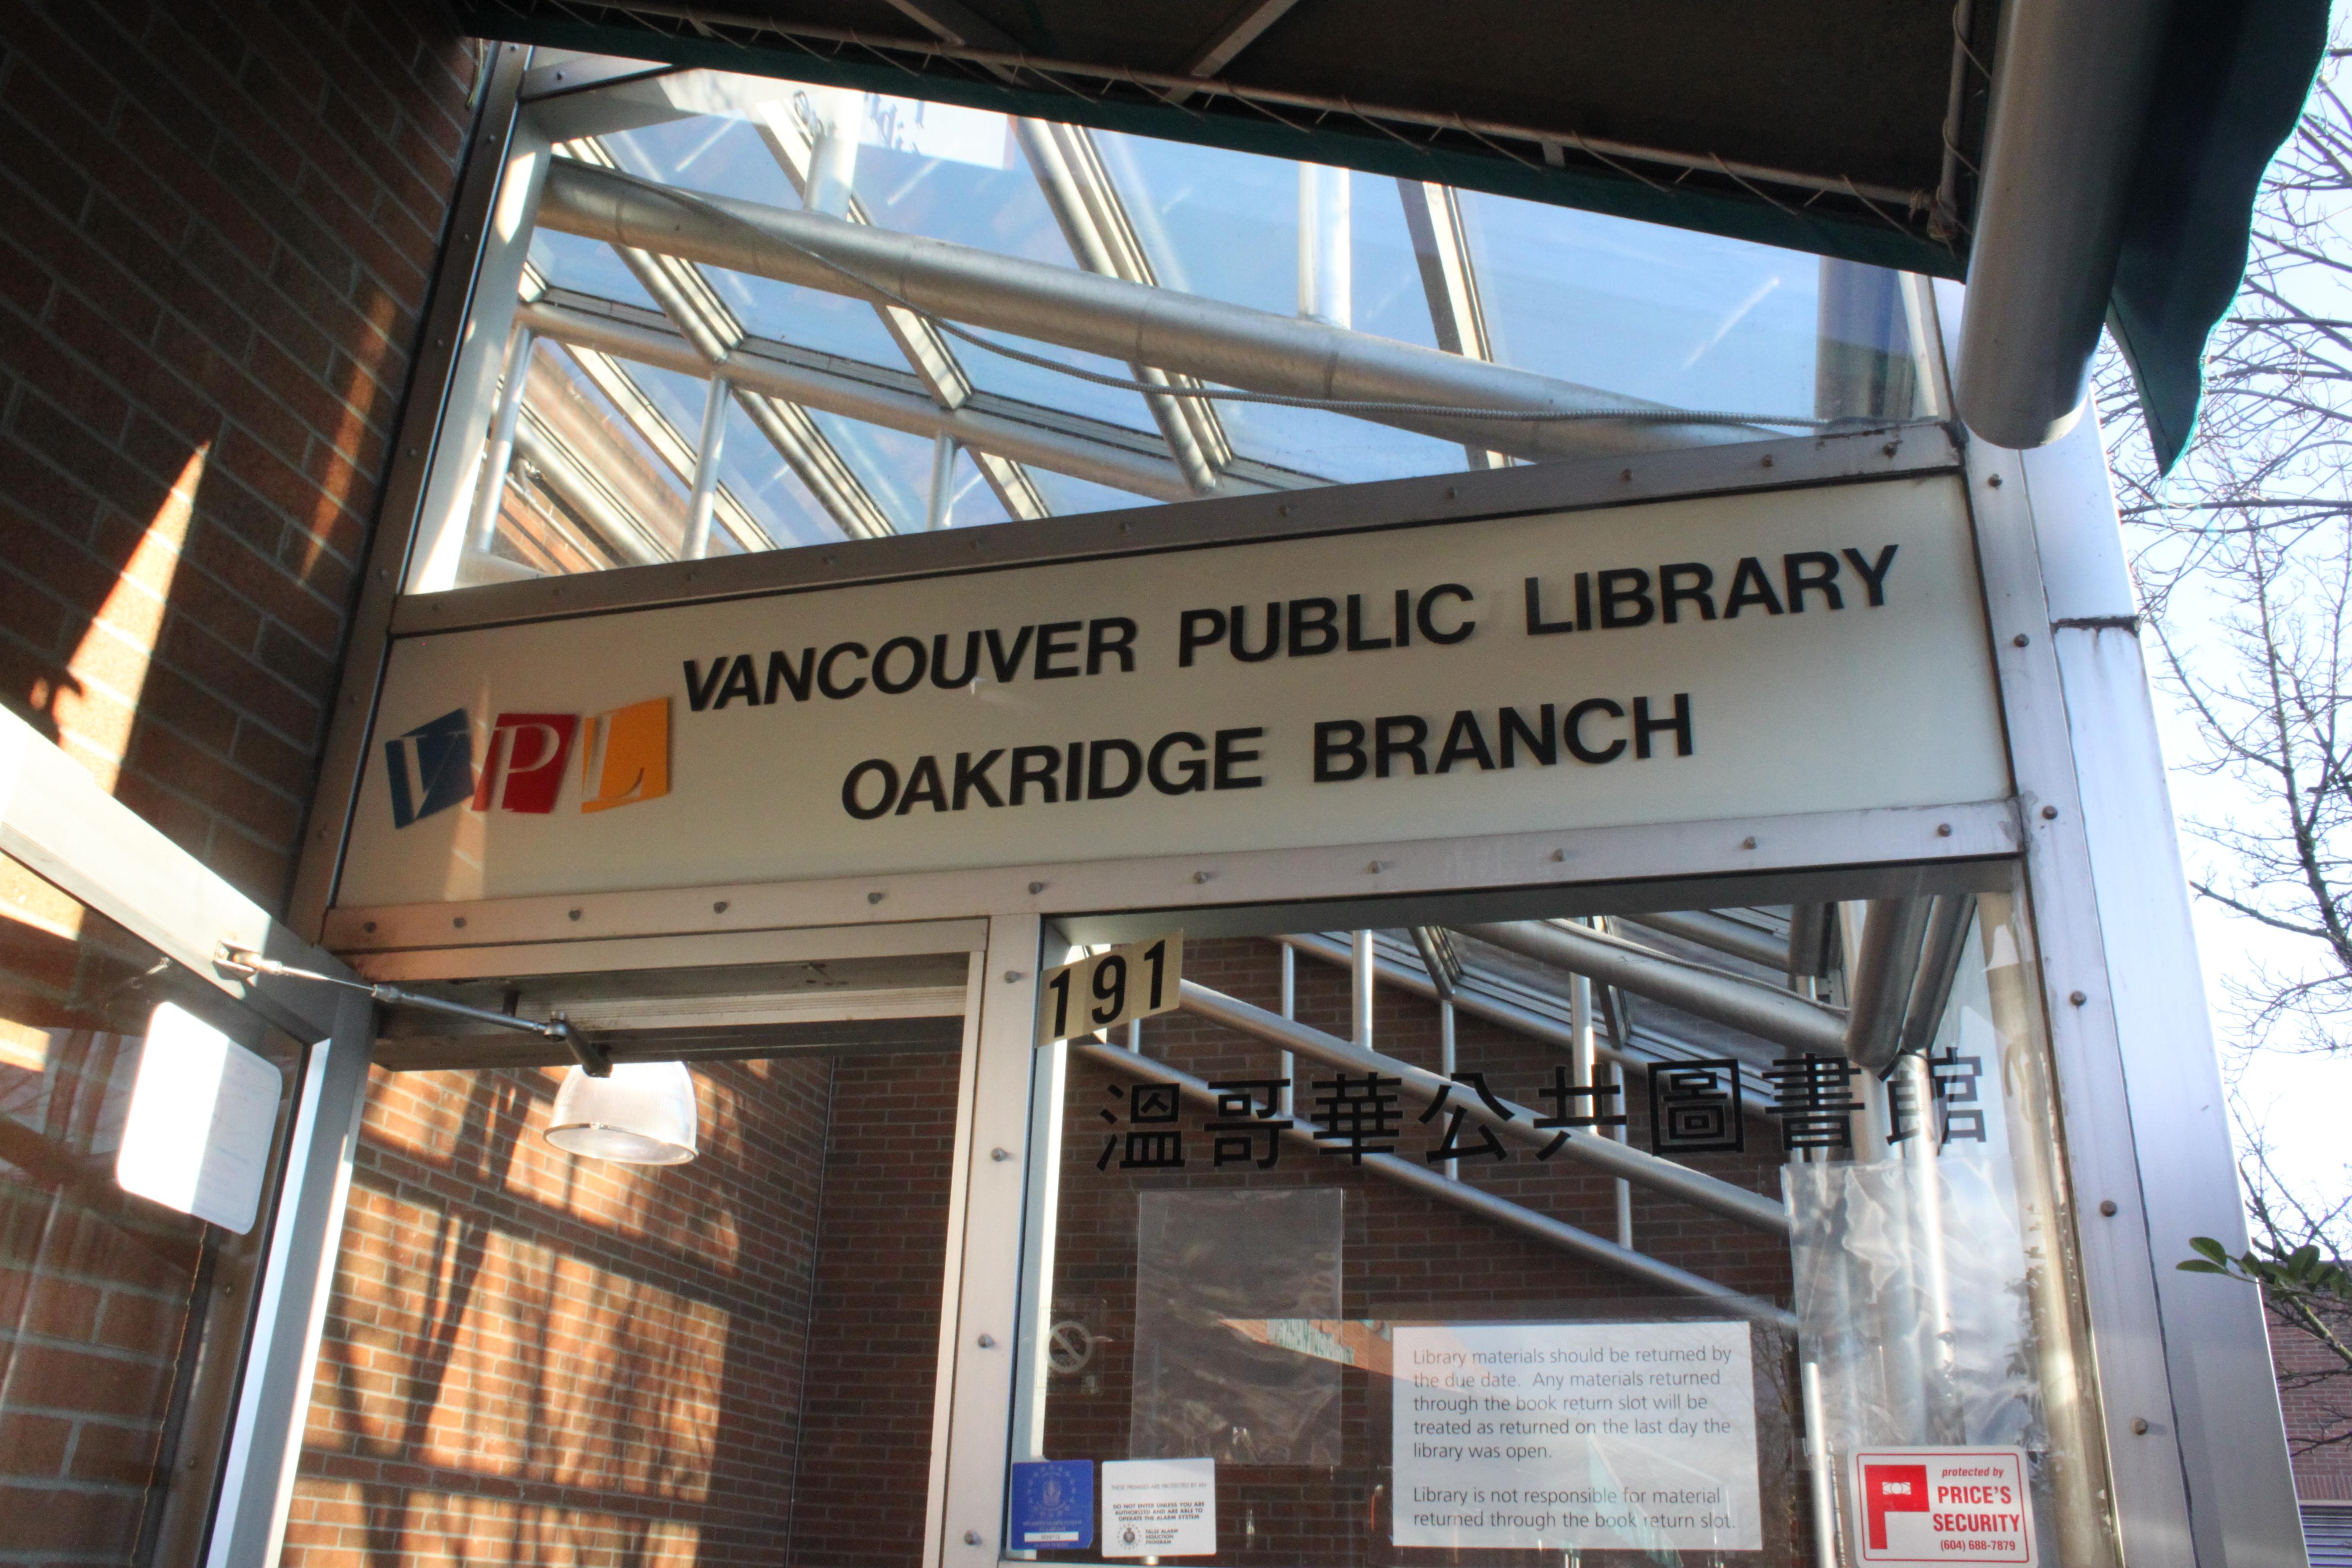 Vancouver Public Library, Oakridge Branch